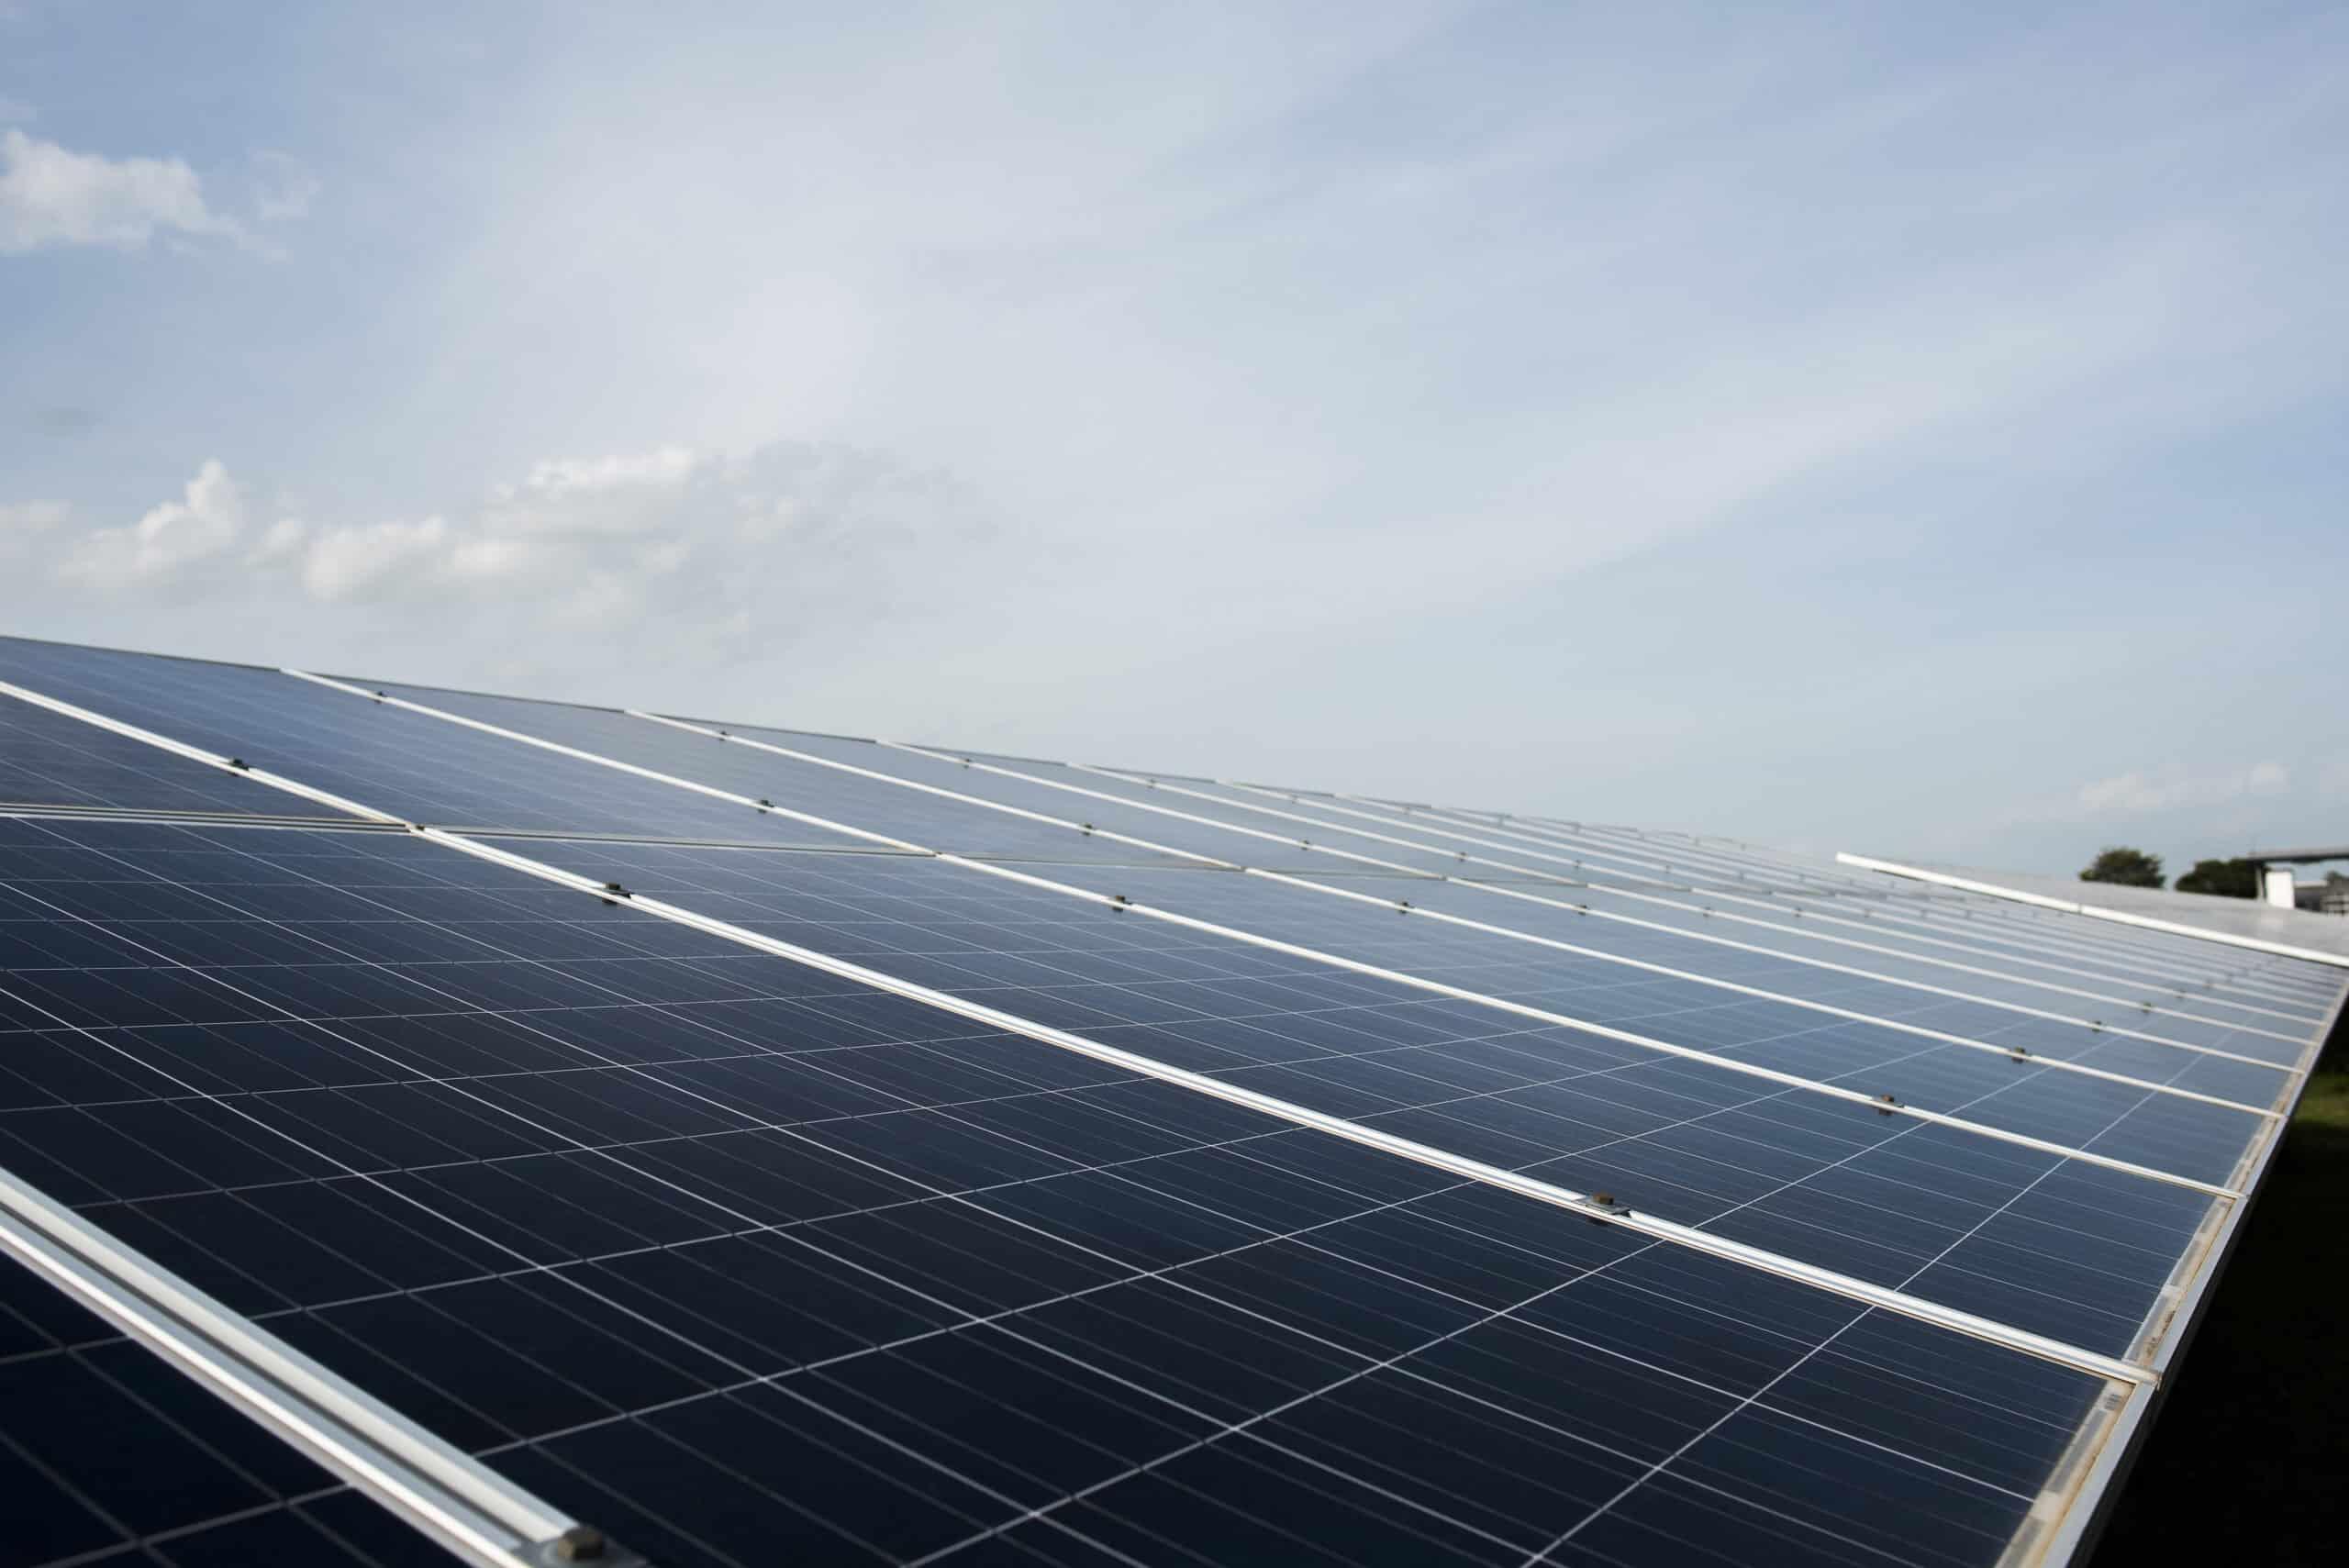 Solar cell farm in power station for alternative energy from the sun